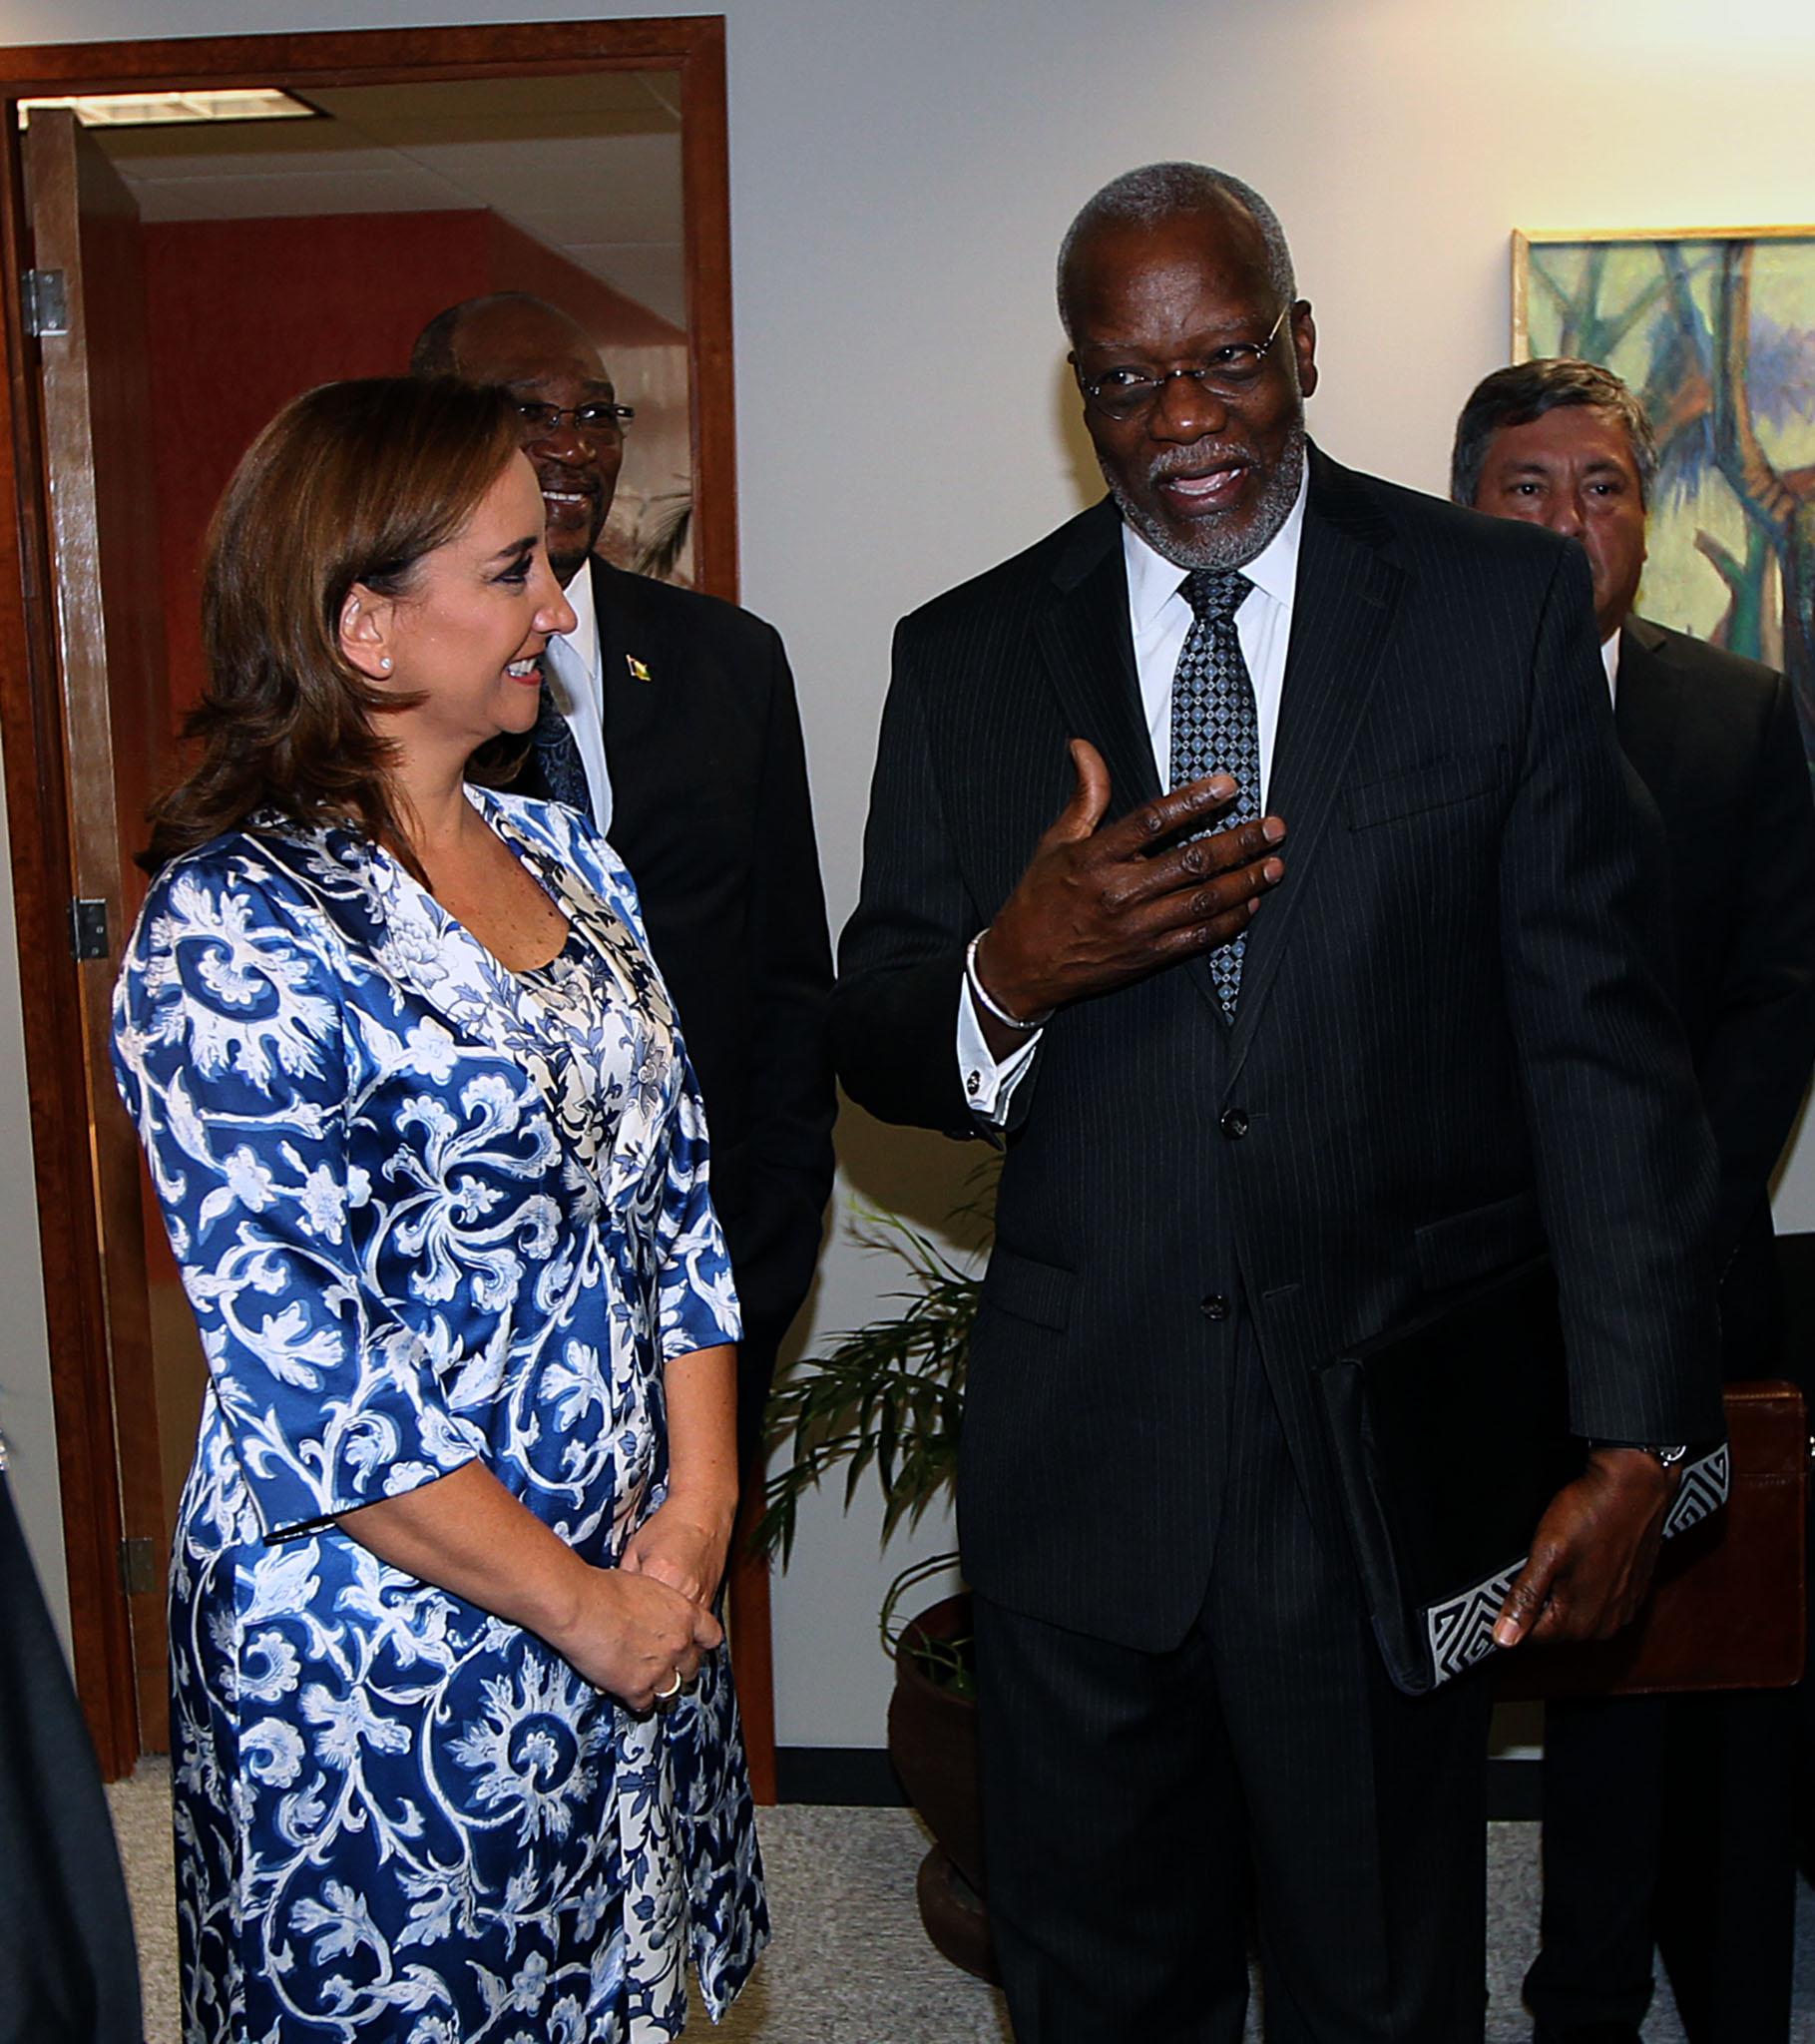 FOTO 3 La canciller Claudia Ruiz Massieu inaugur  oficina para embajadas concurrentes del Caribe.jpg